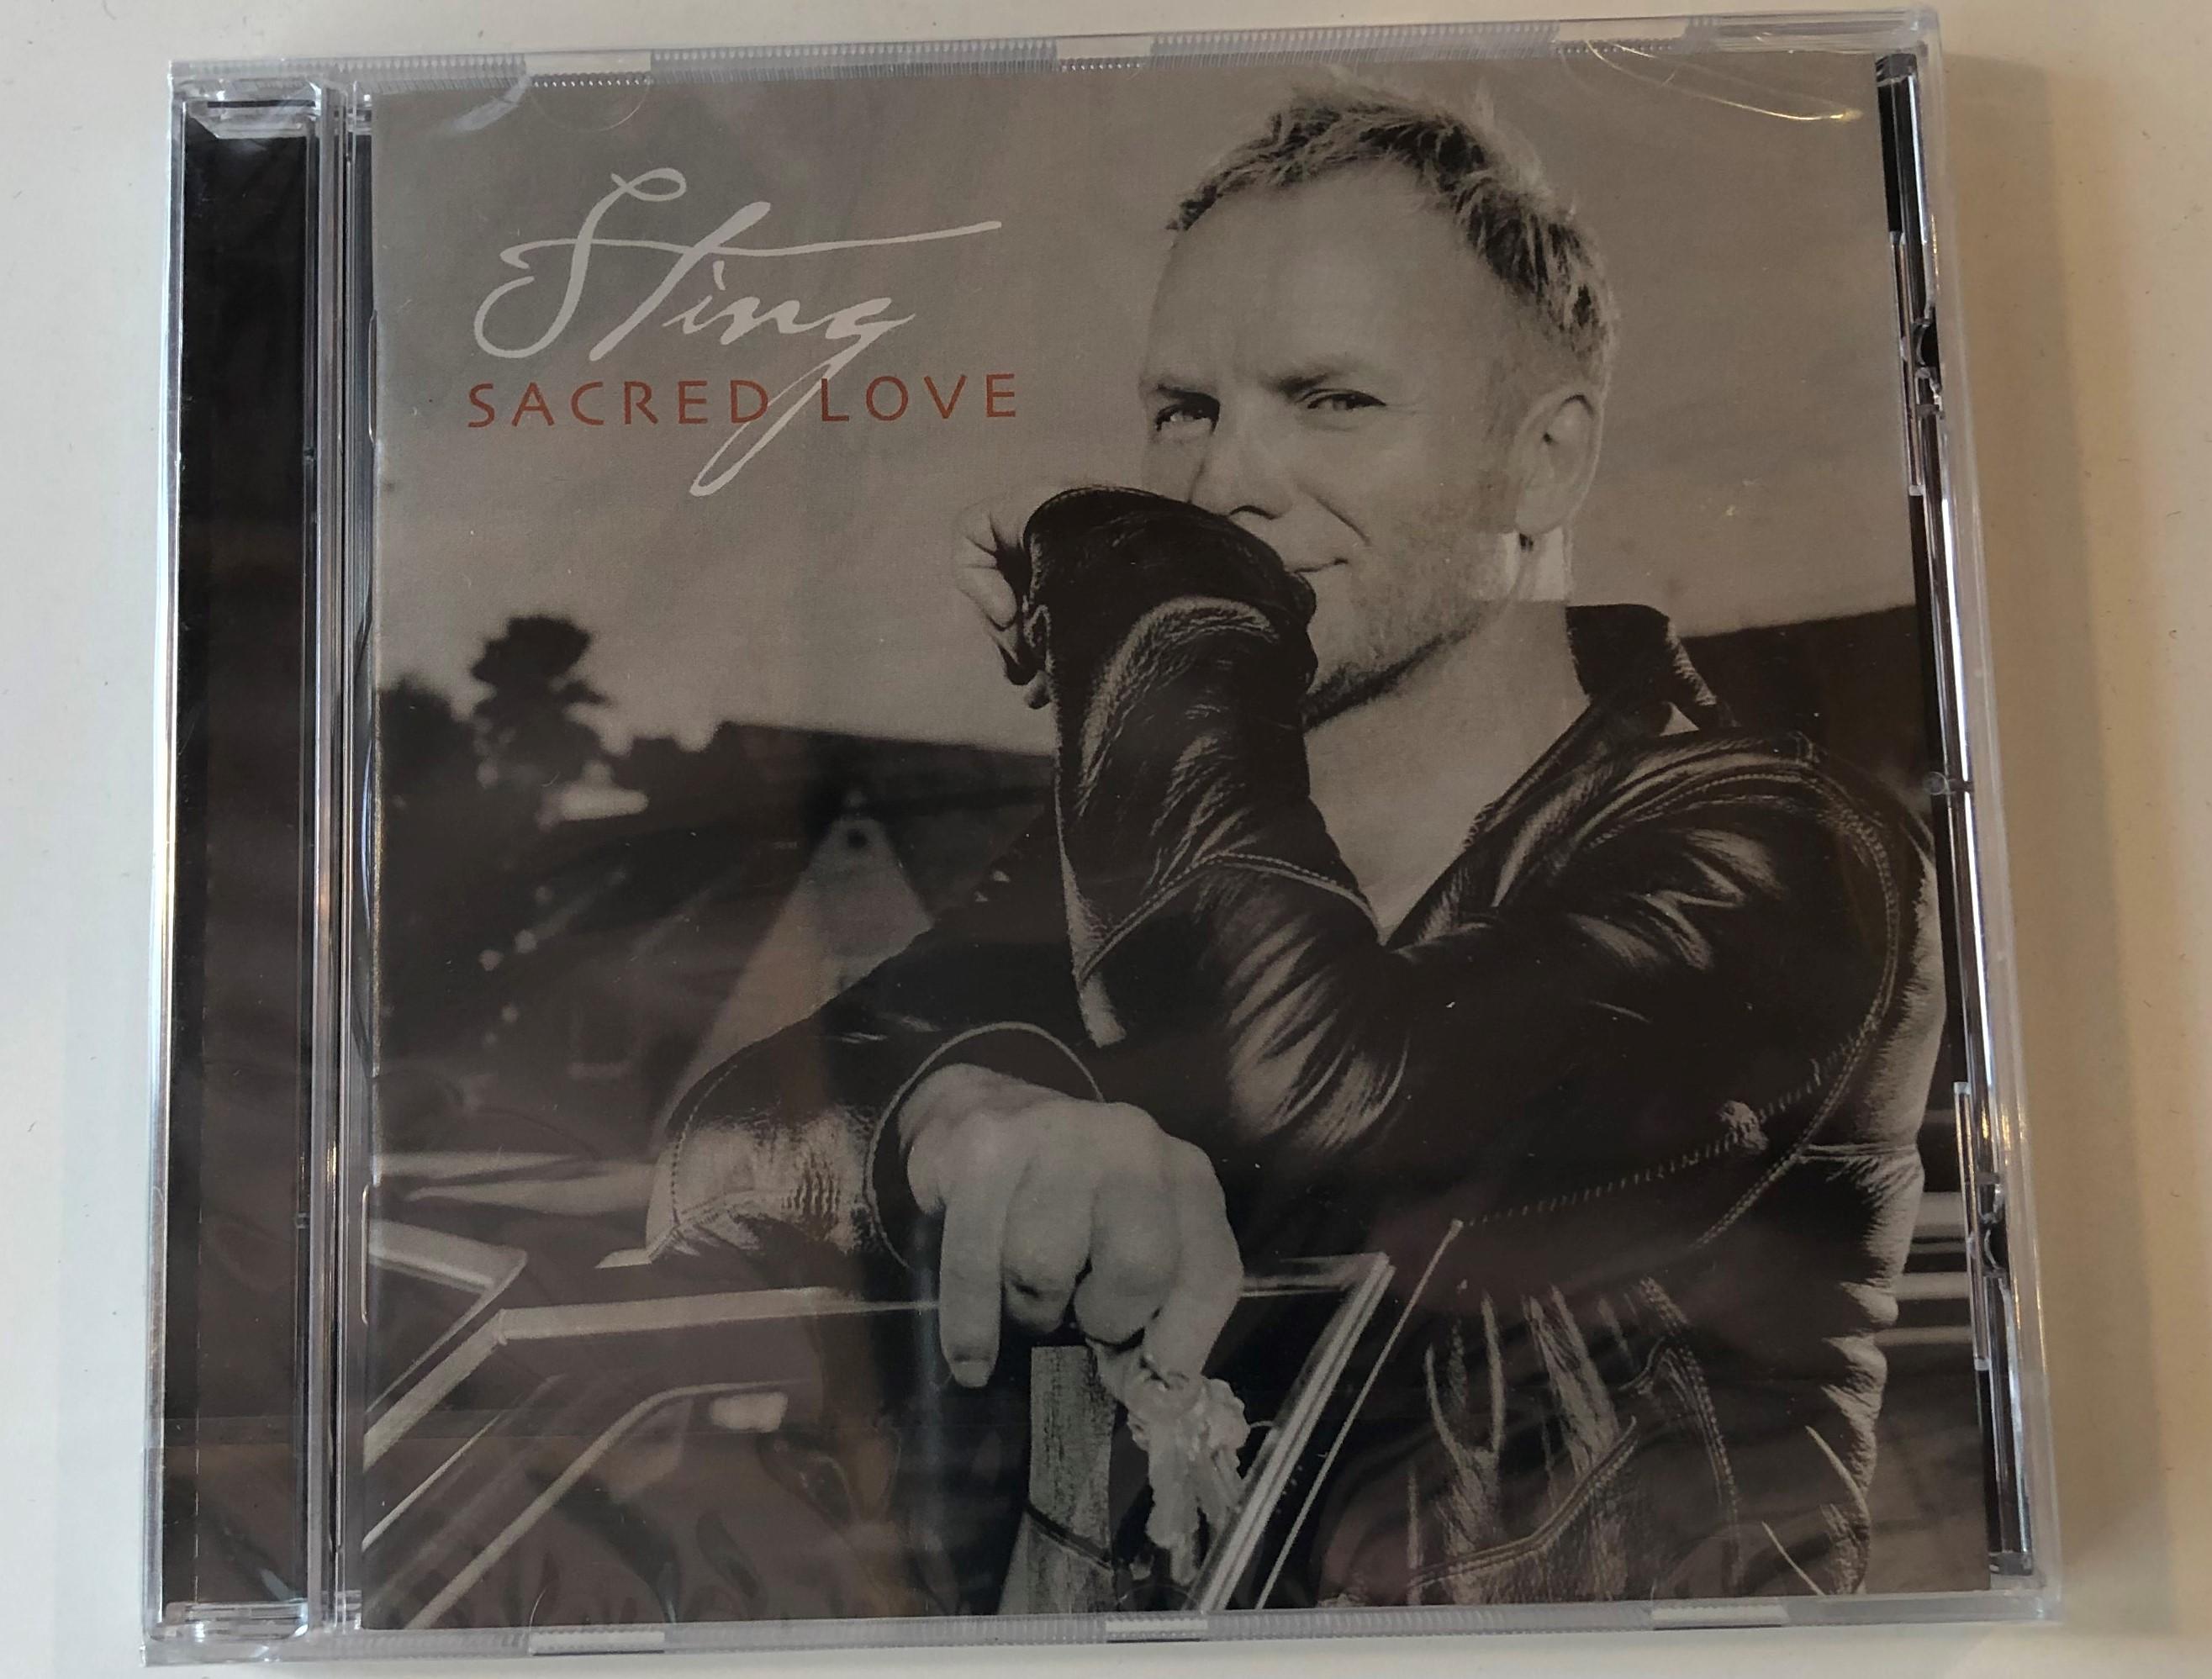 sting-sacred-love-a-m-records-audio-cd-2004-0602498196397-1-.jpg